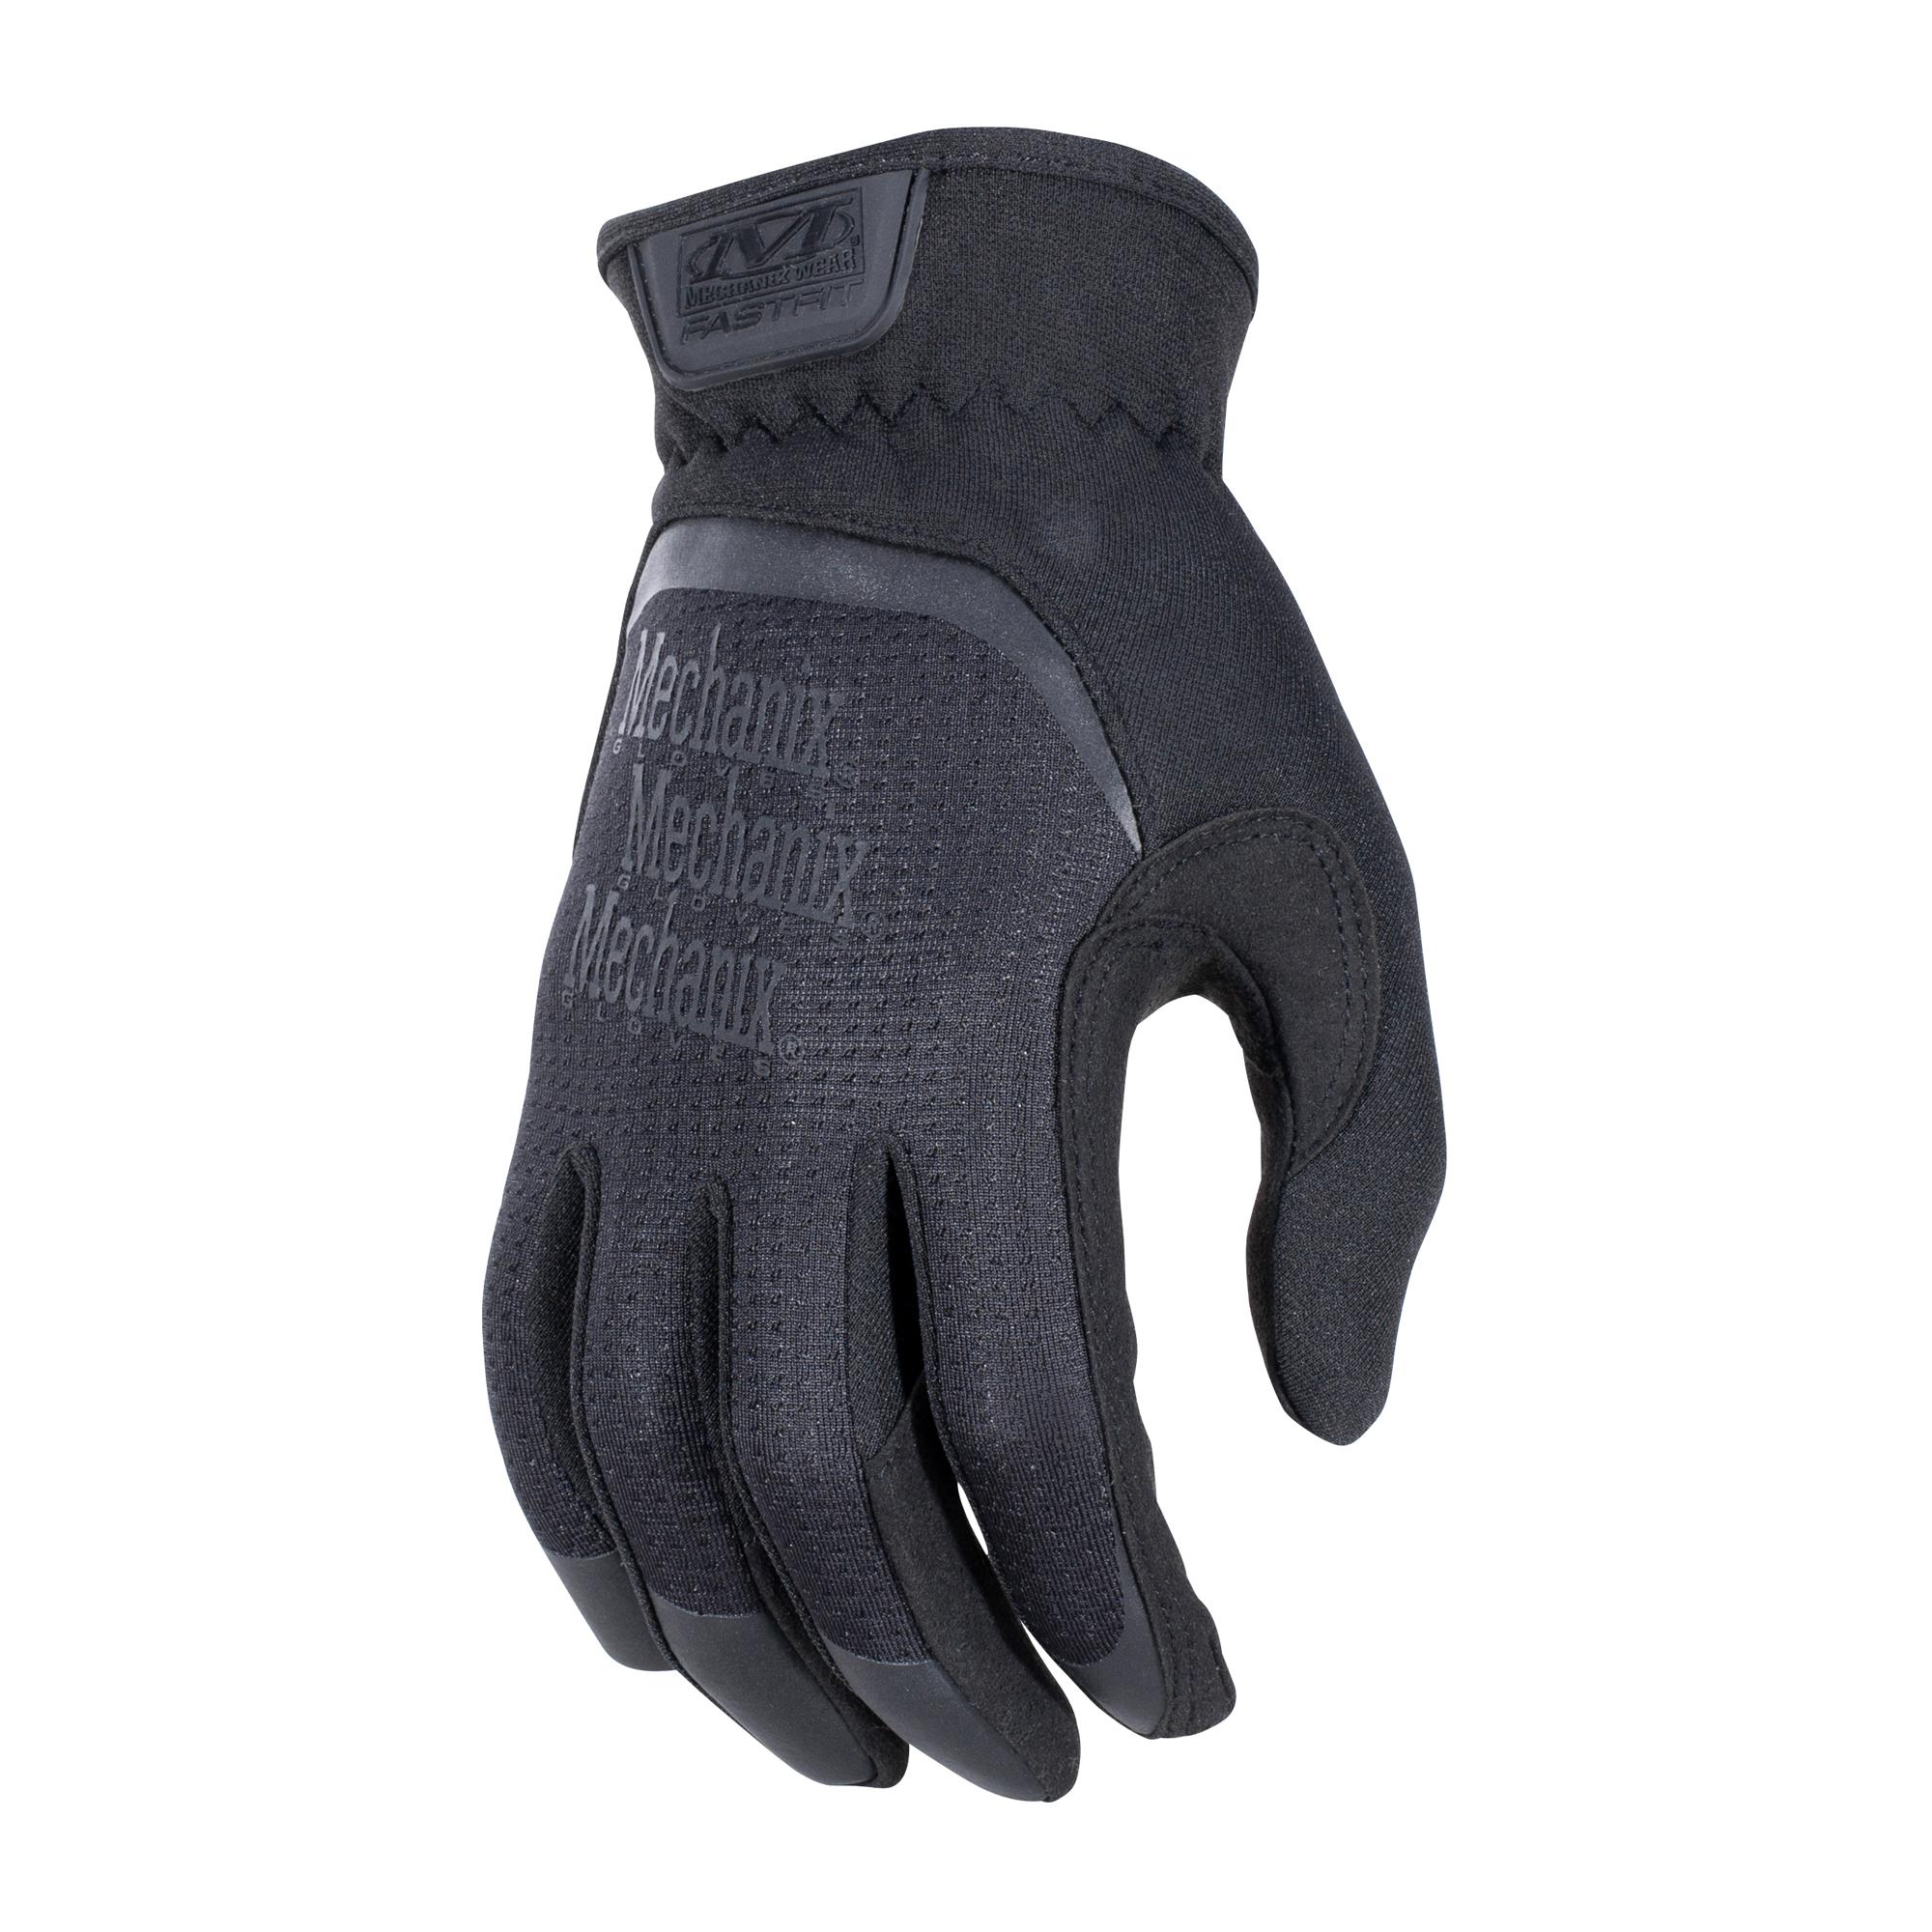 Mechanix Gloves Womens Fastfit Covert black